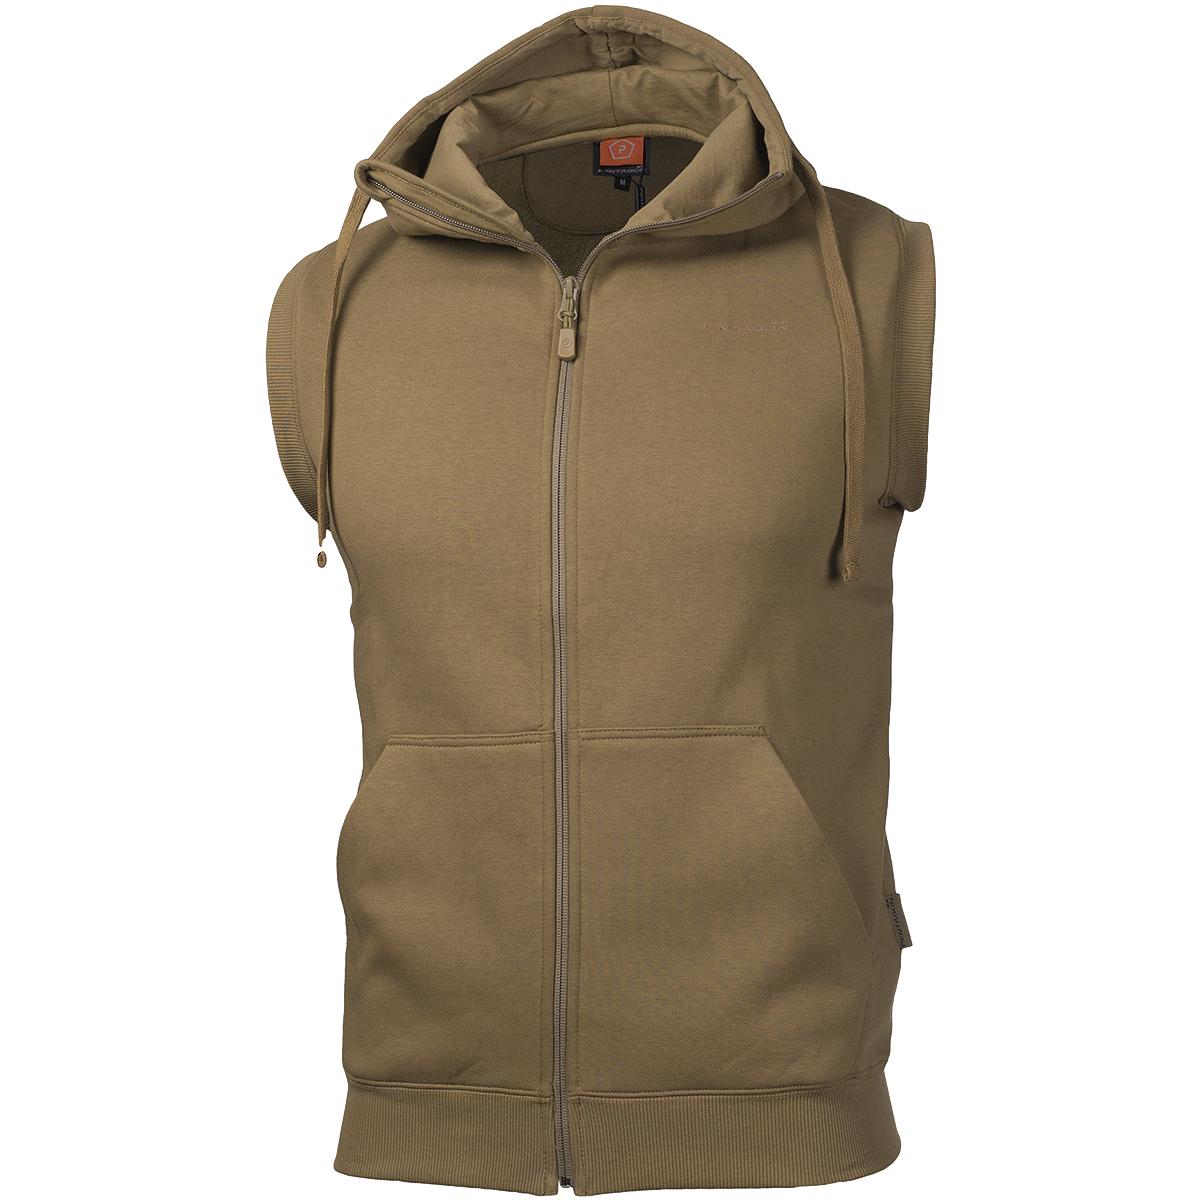 Sweater vest hoodie